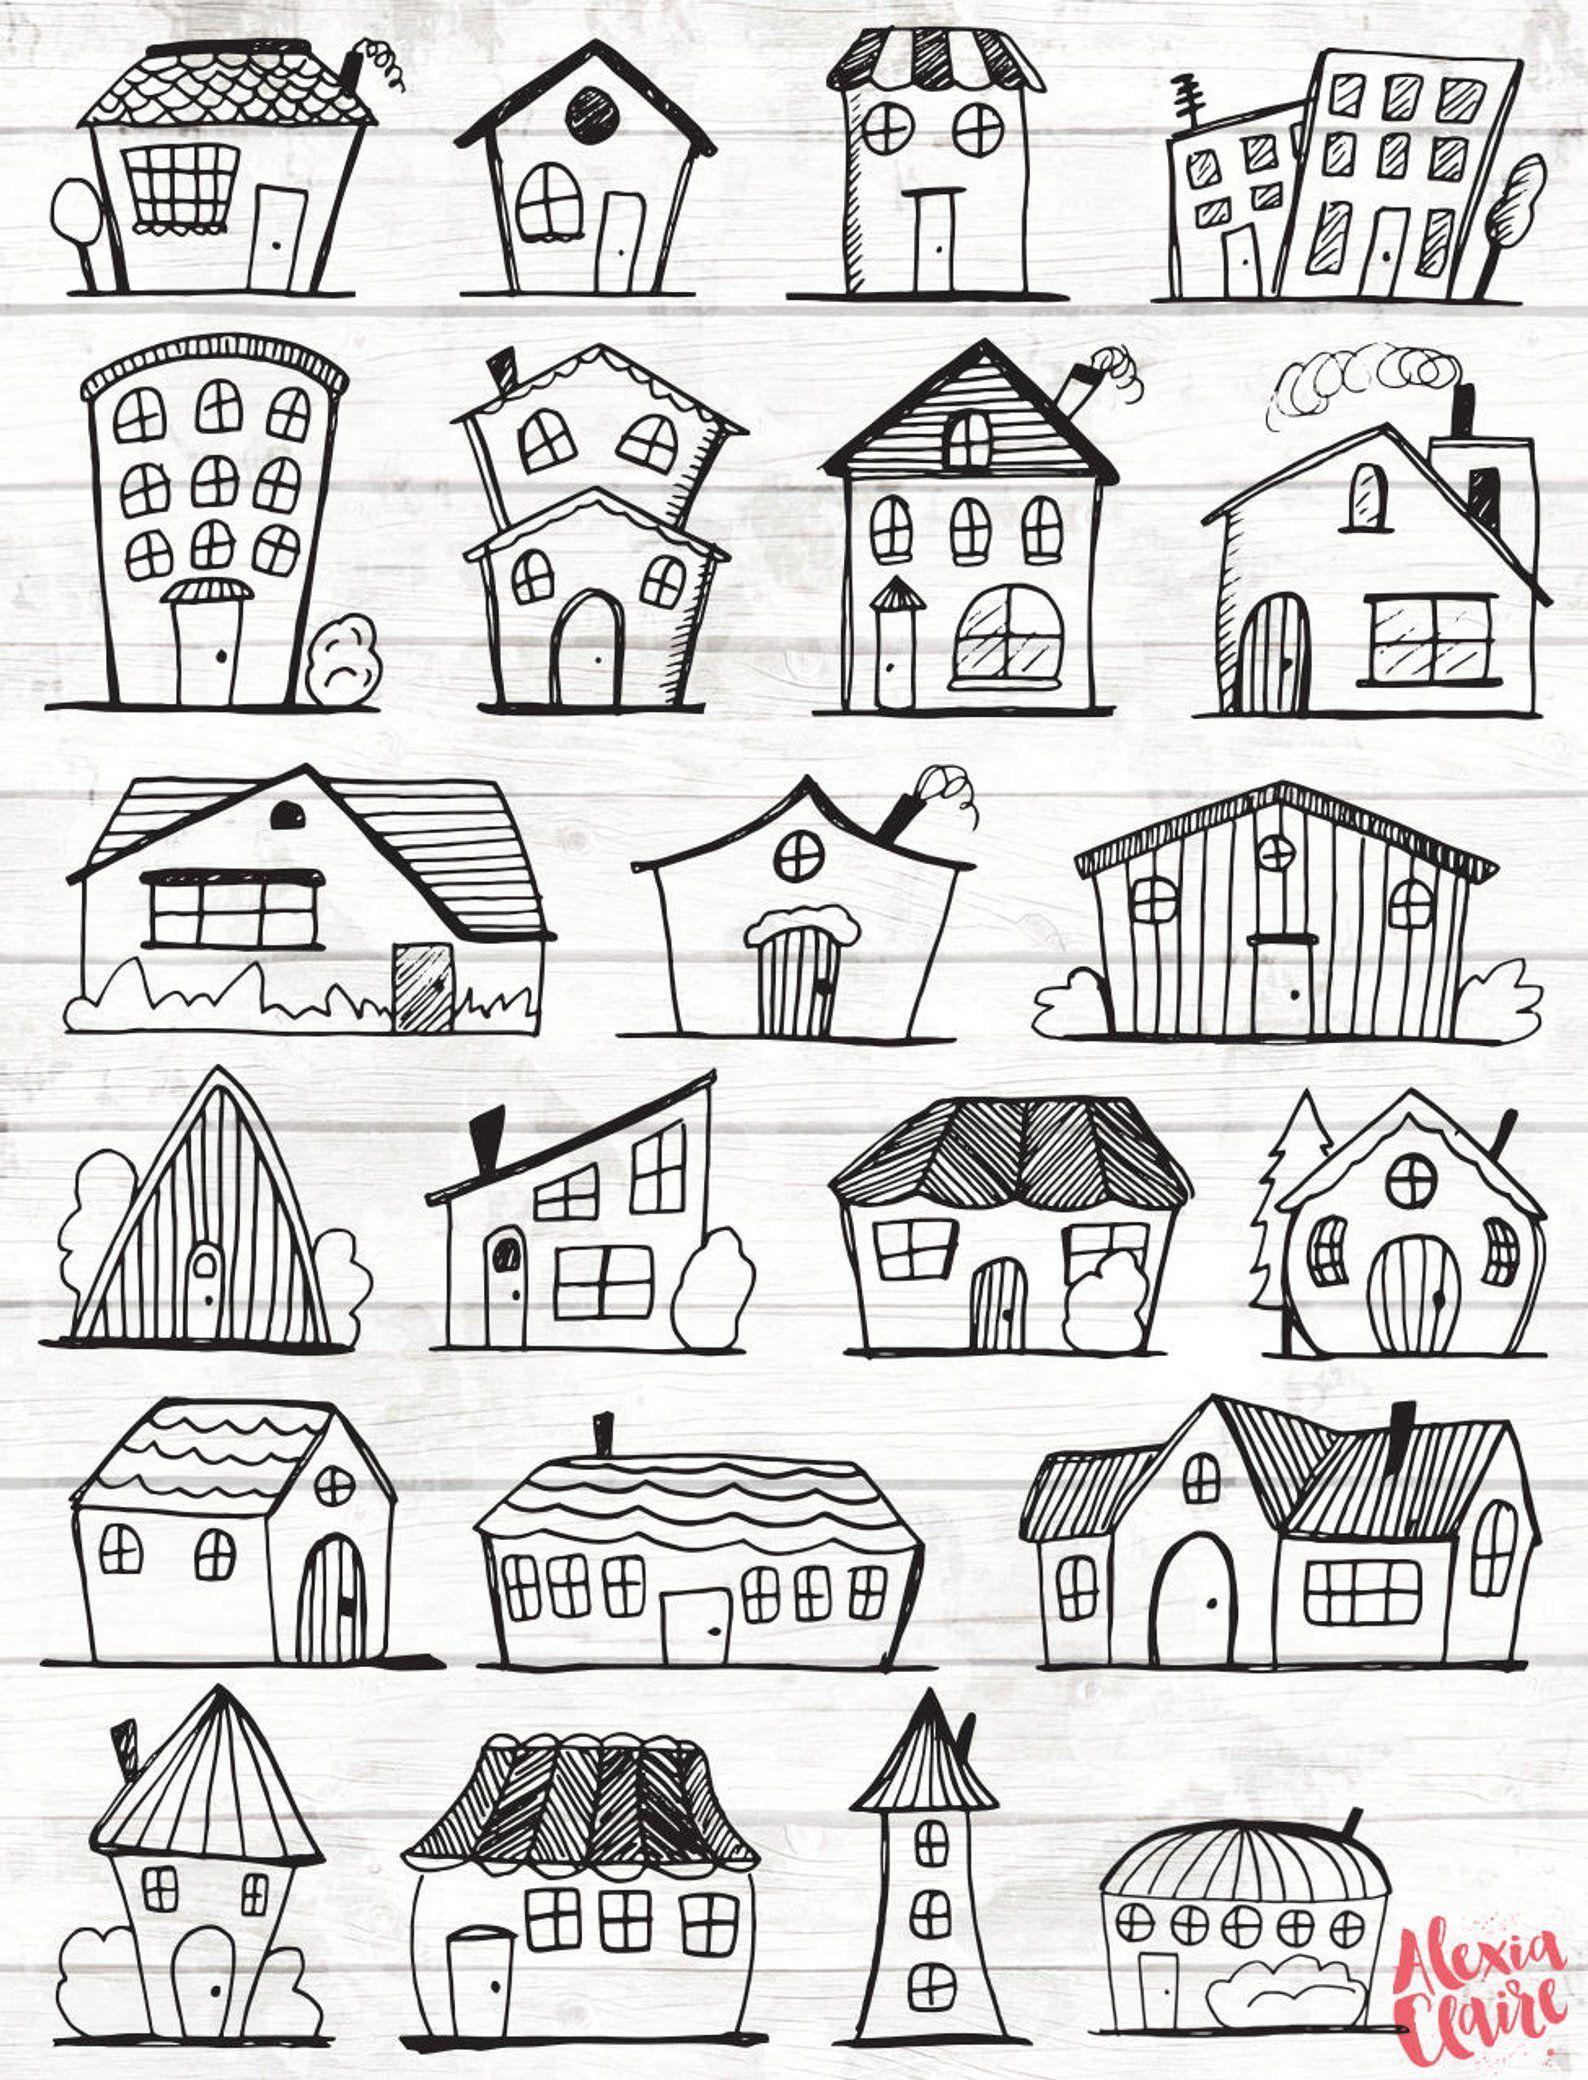 doodle haus clipart vektor kunst stadt png home vector download illustr illyustracii ruk risunki karakuli schmetterling vektoren